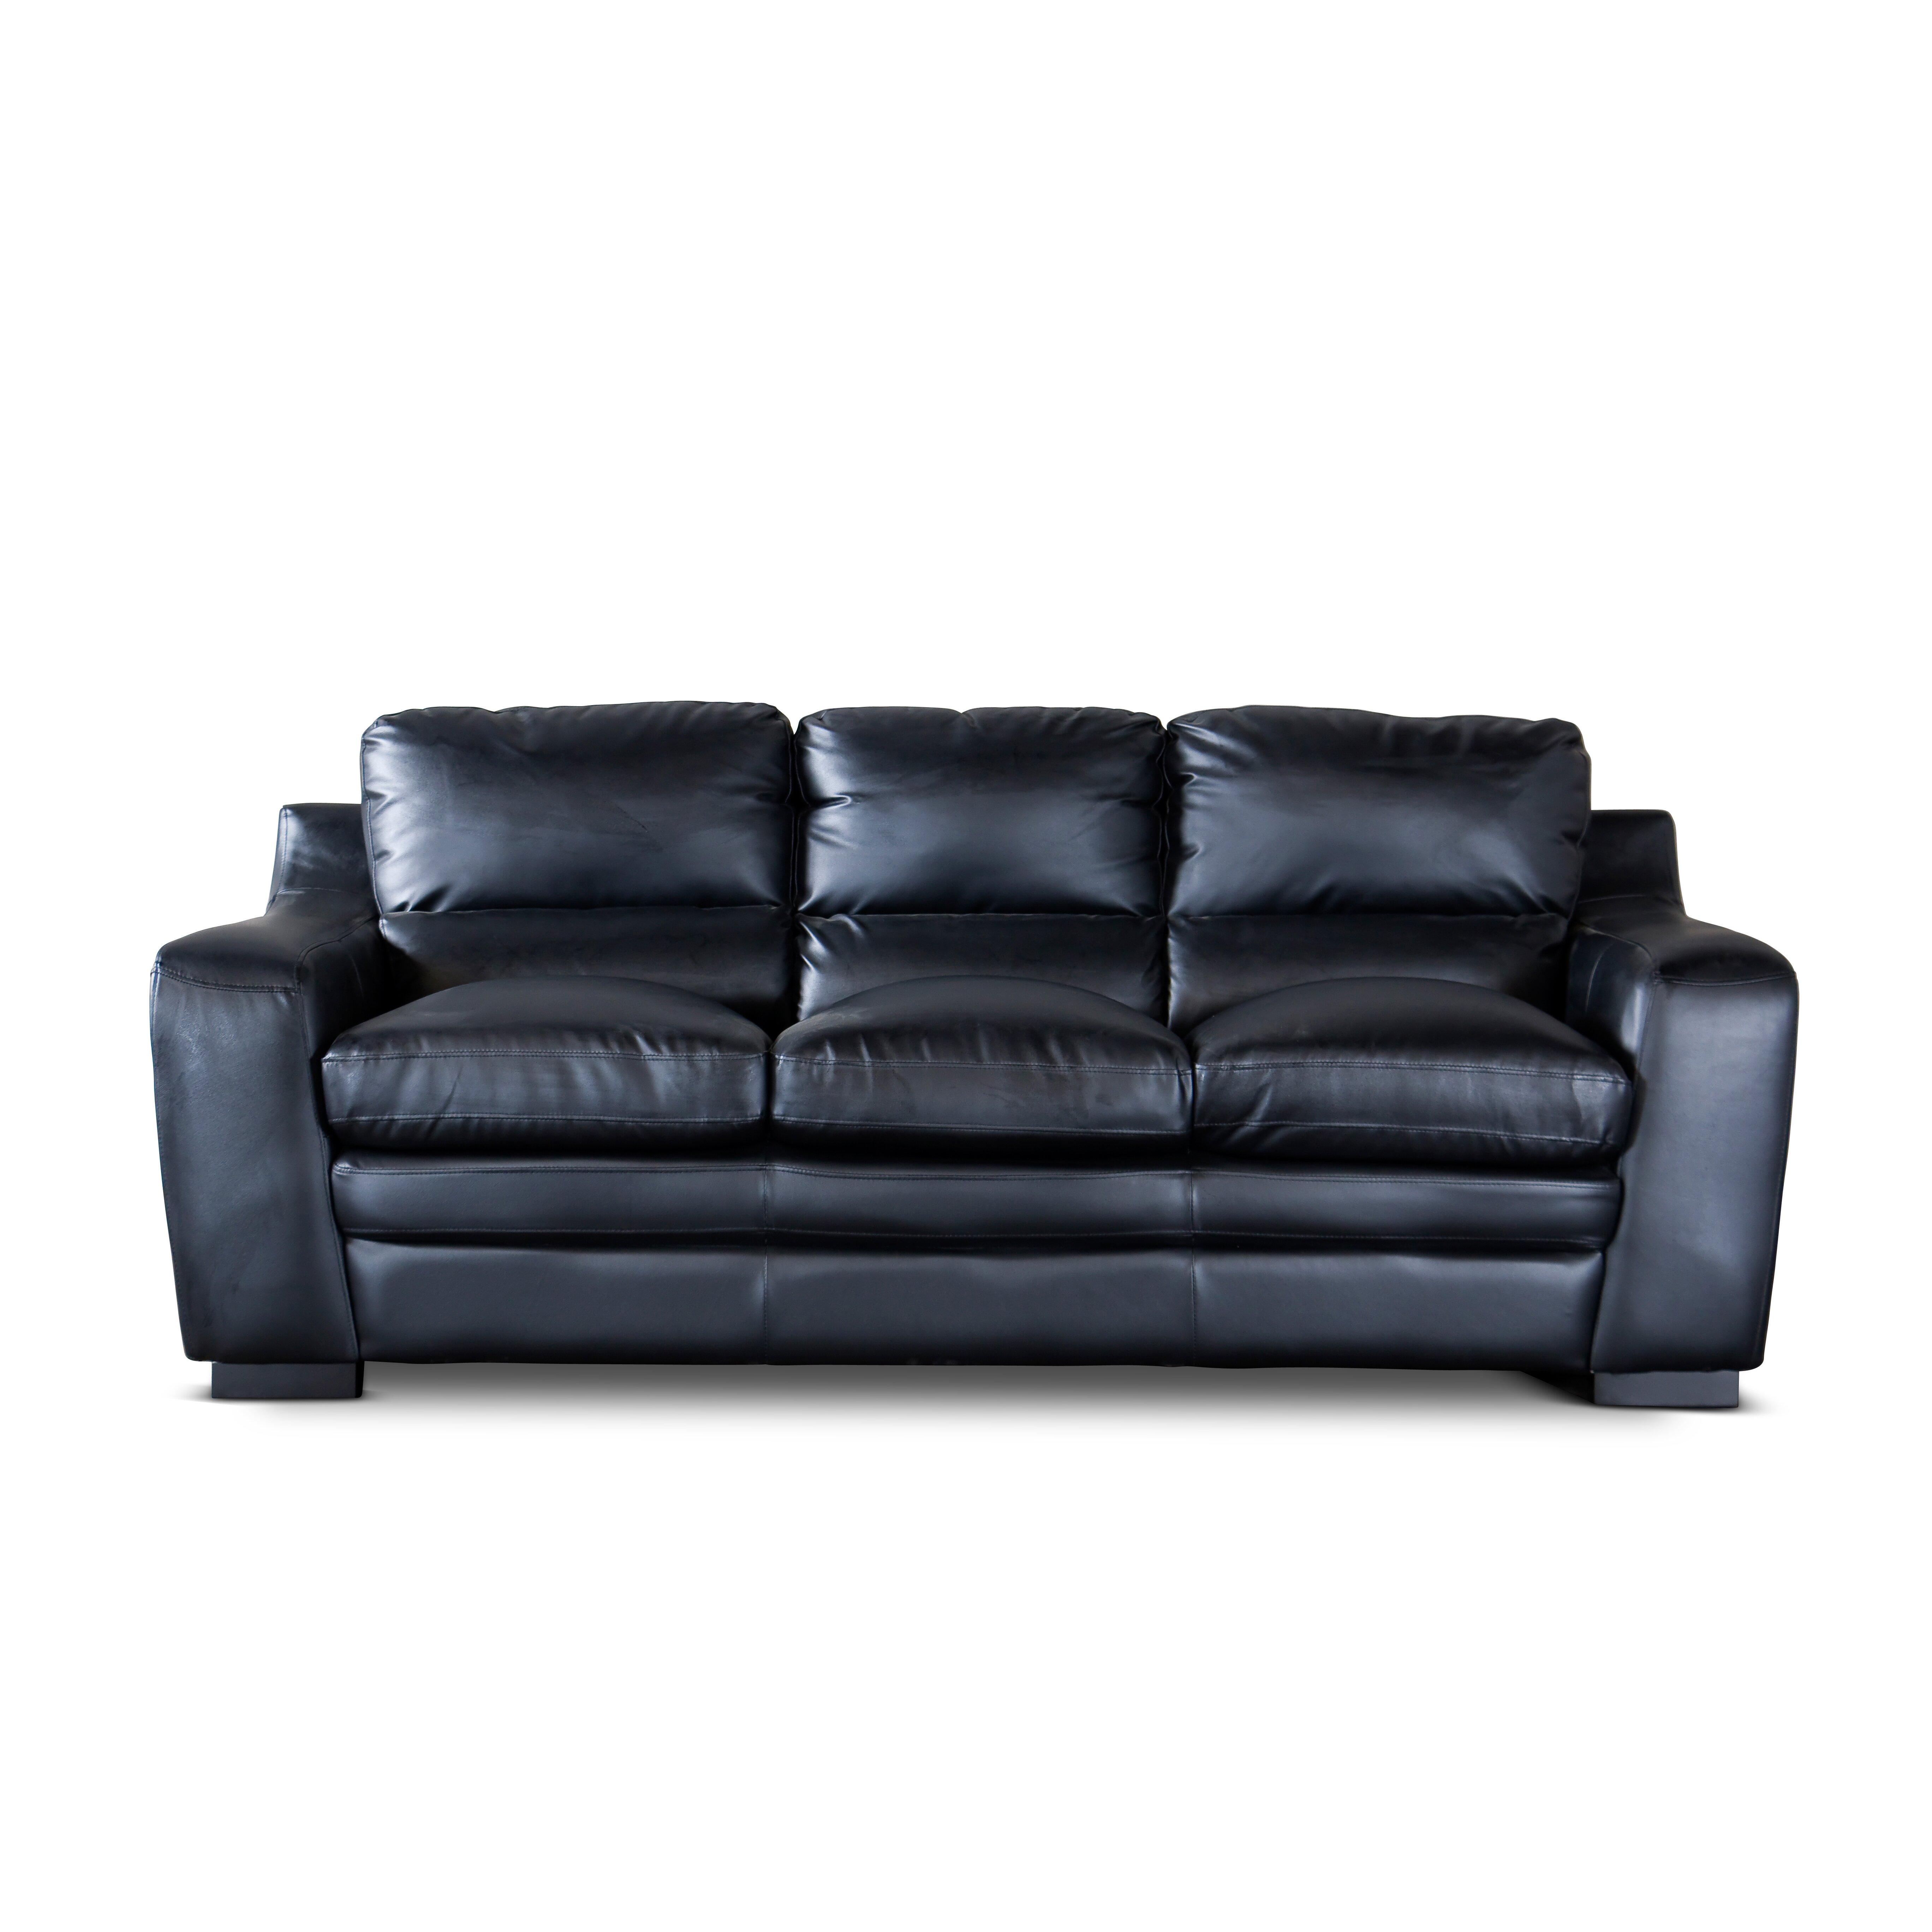 Wholesale interiors baxton studio diplomat 2 piece sofa for 2 piece sofa set